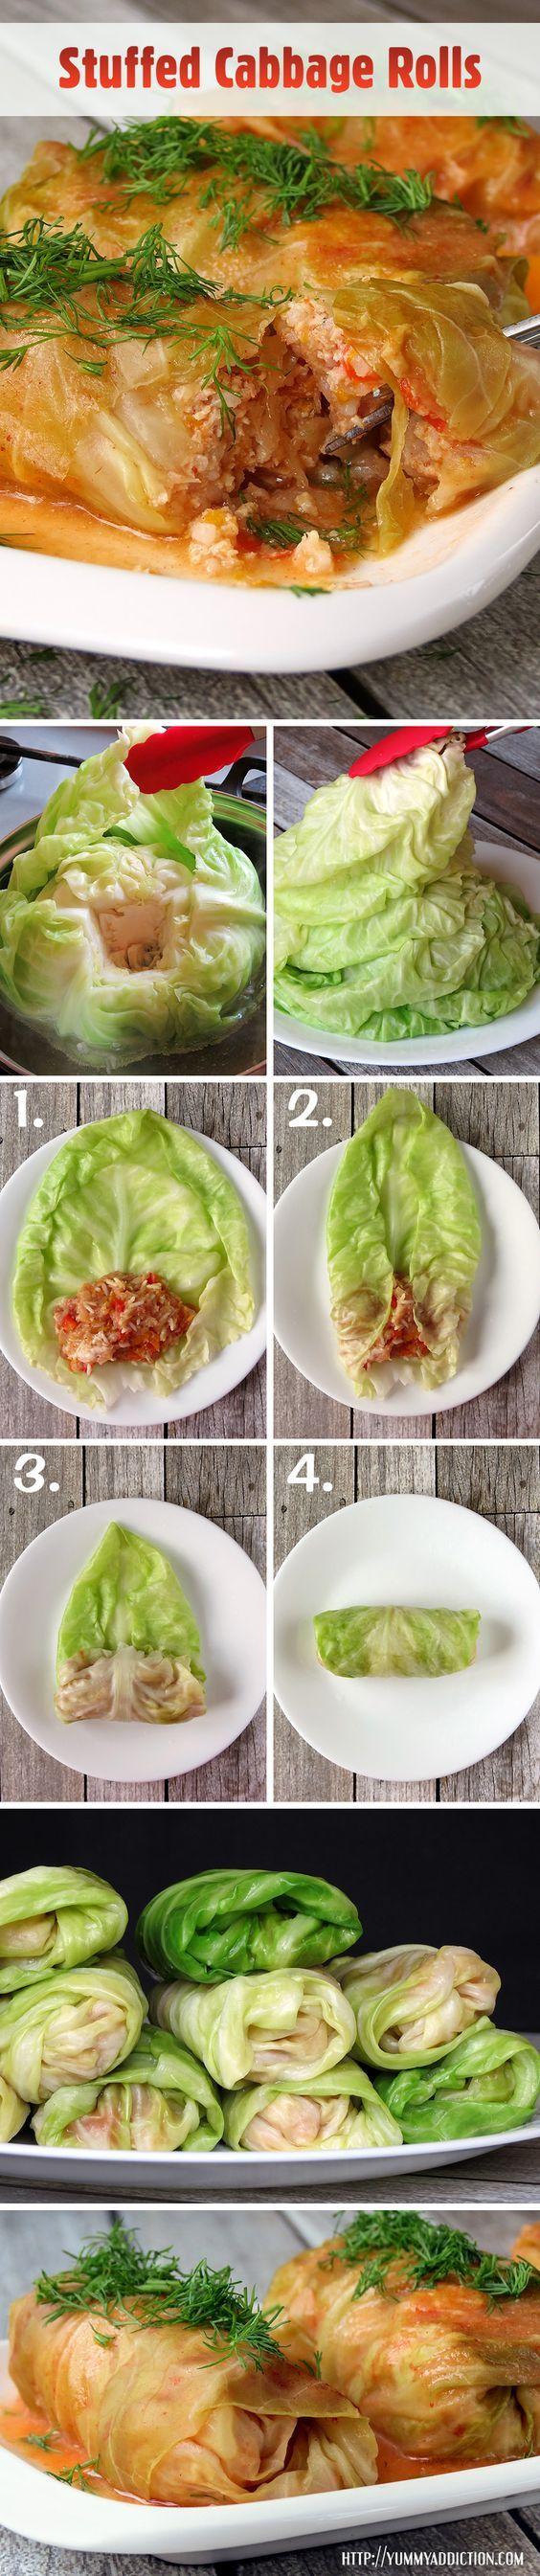 Stuffed Cabbage Rolls | YummyAddiction.com